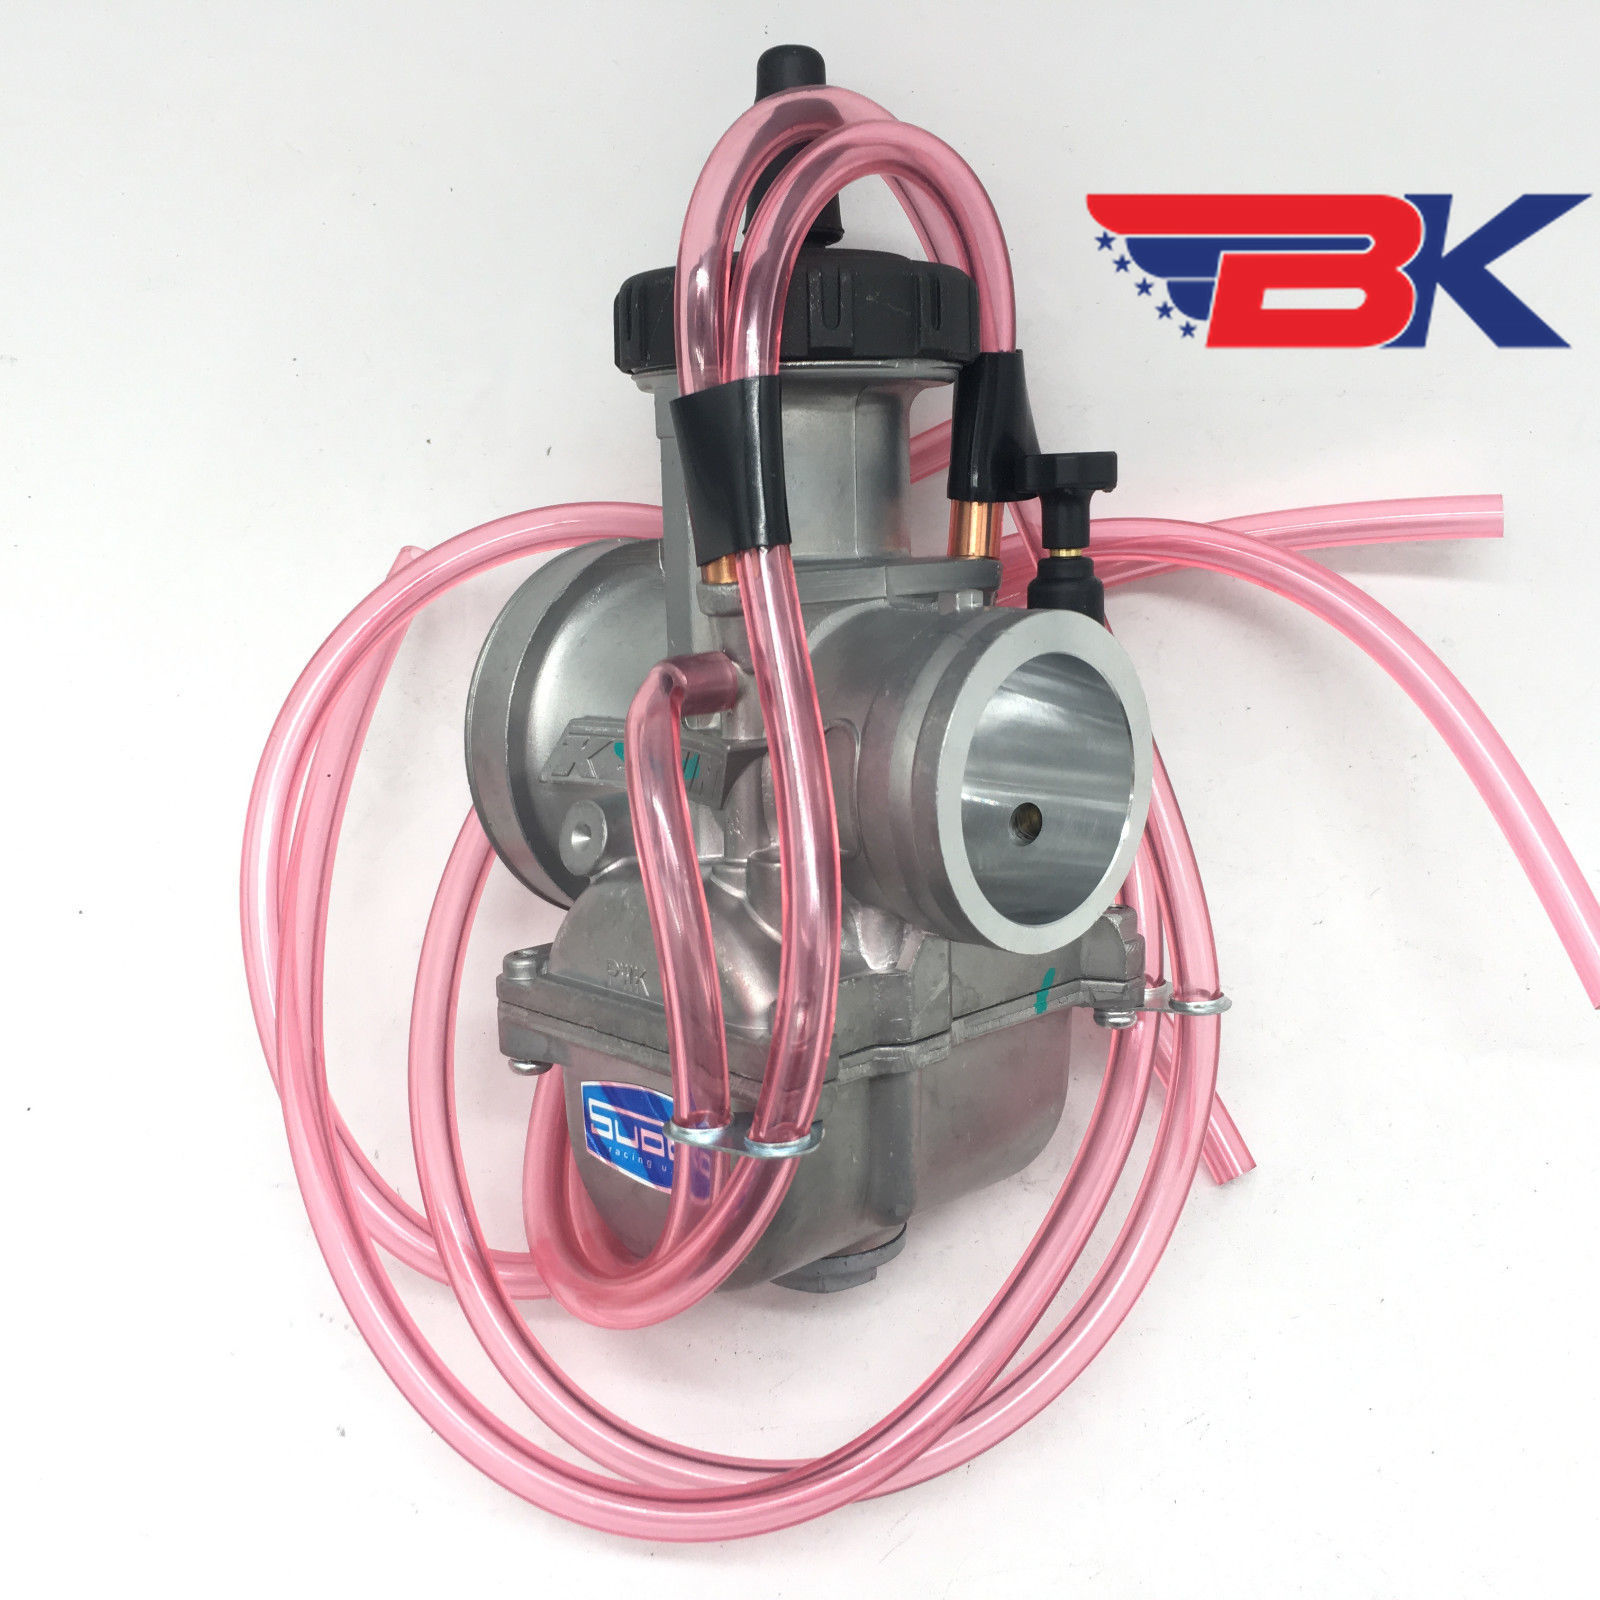 Yamaha YFZ 350 Banshee Dual Throttle Cables for KEIHIN PWK PJ PWM Carburetors